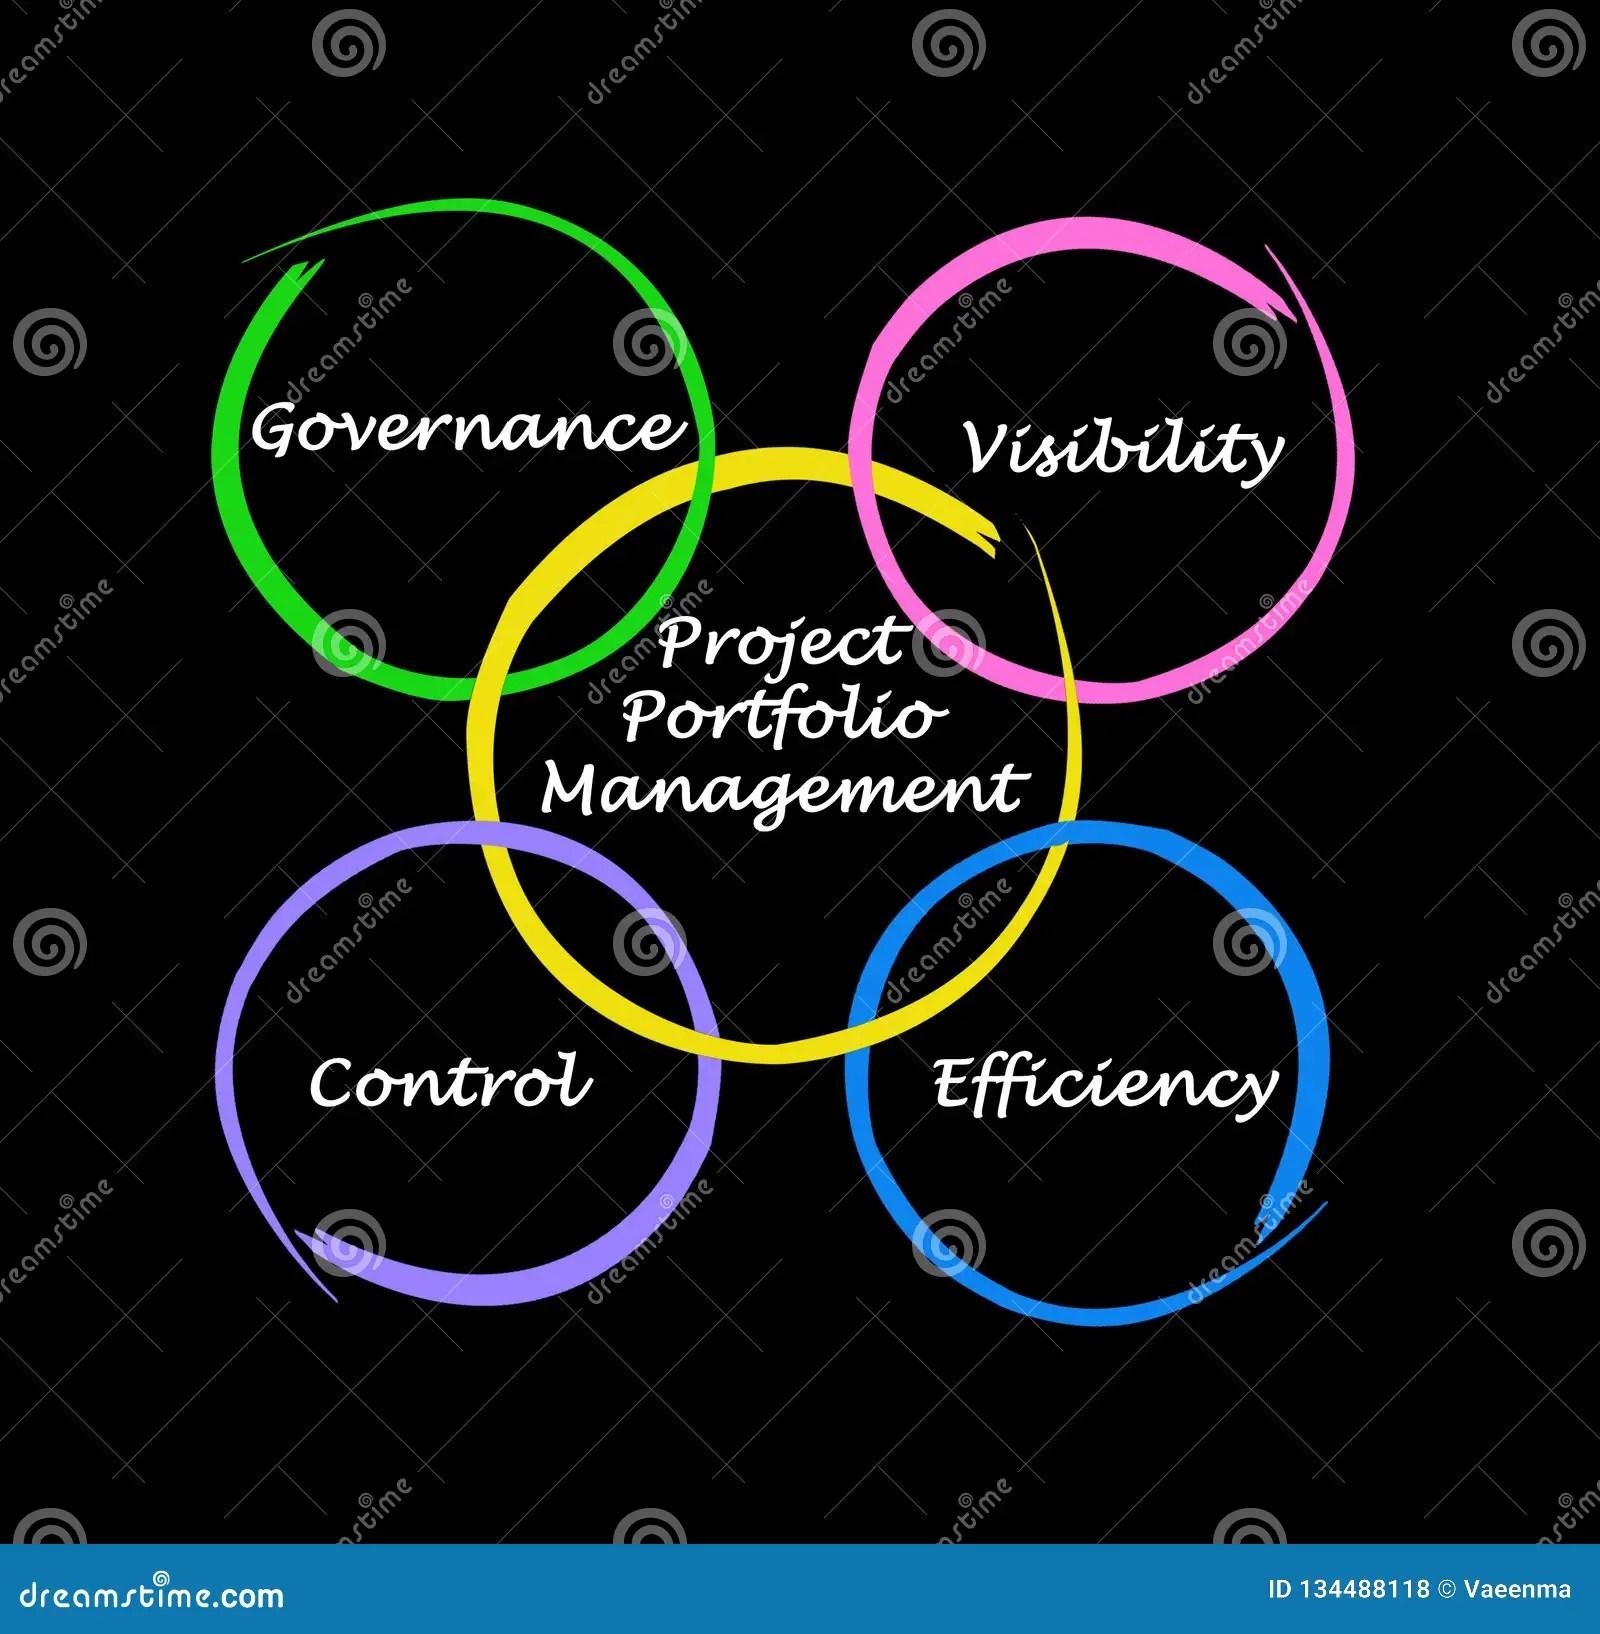 hight resolution of project portfolio management stock illustrations 952 project portfolio management stock illustrations vectors clipart dreamstime